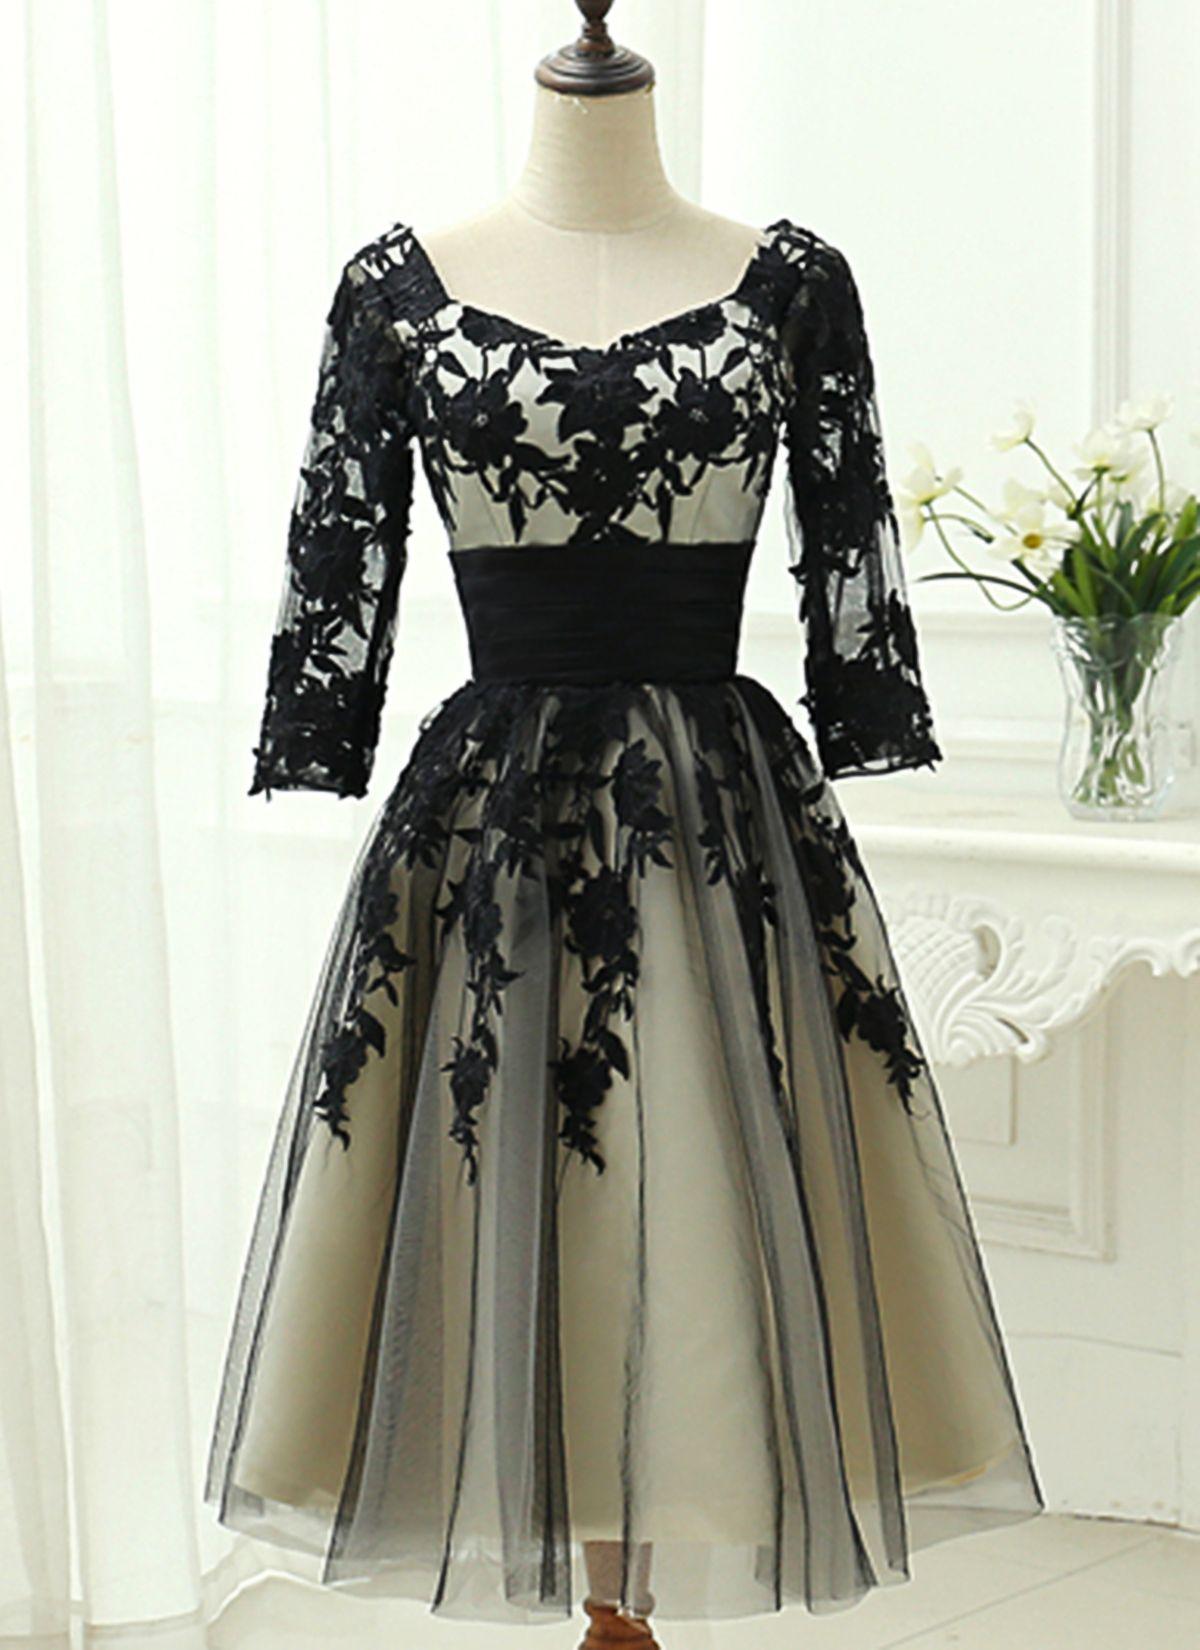 Black Lace Mid Sleeve Mid Length A Line Prom Dress Party Dress Tea Length Bridesmaid Dresses Party Dress Dresses [ 1650 x 1200 Pixel ]